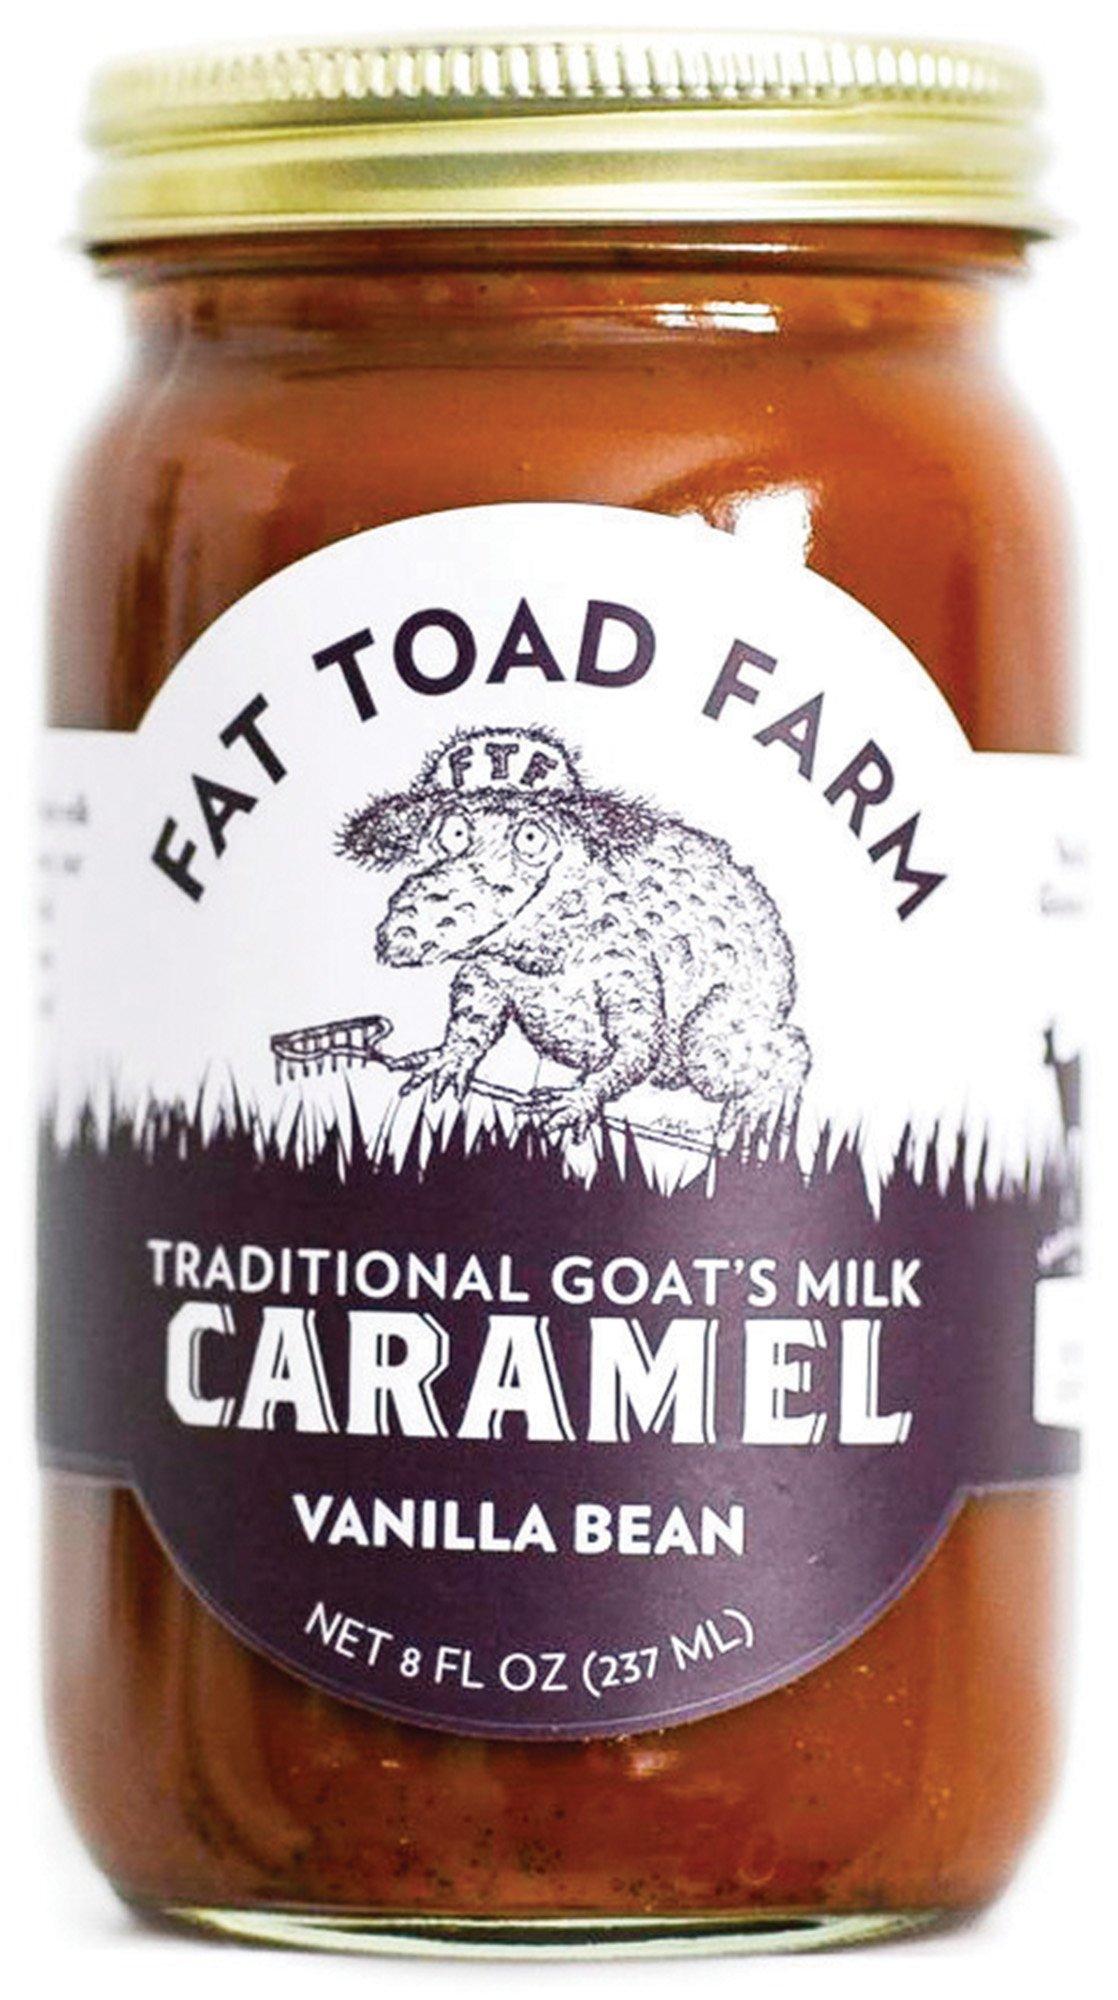 Fat Toad Farm Traditional Goats Milk Caramel Sauce, Vanilla Bean, 8fl oz Jar,